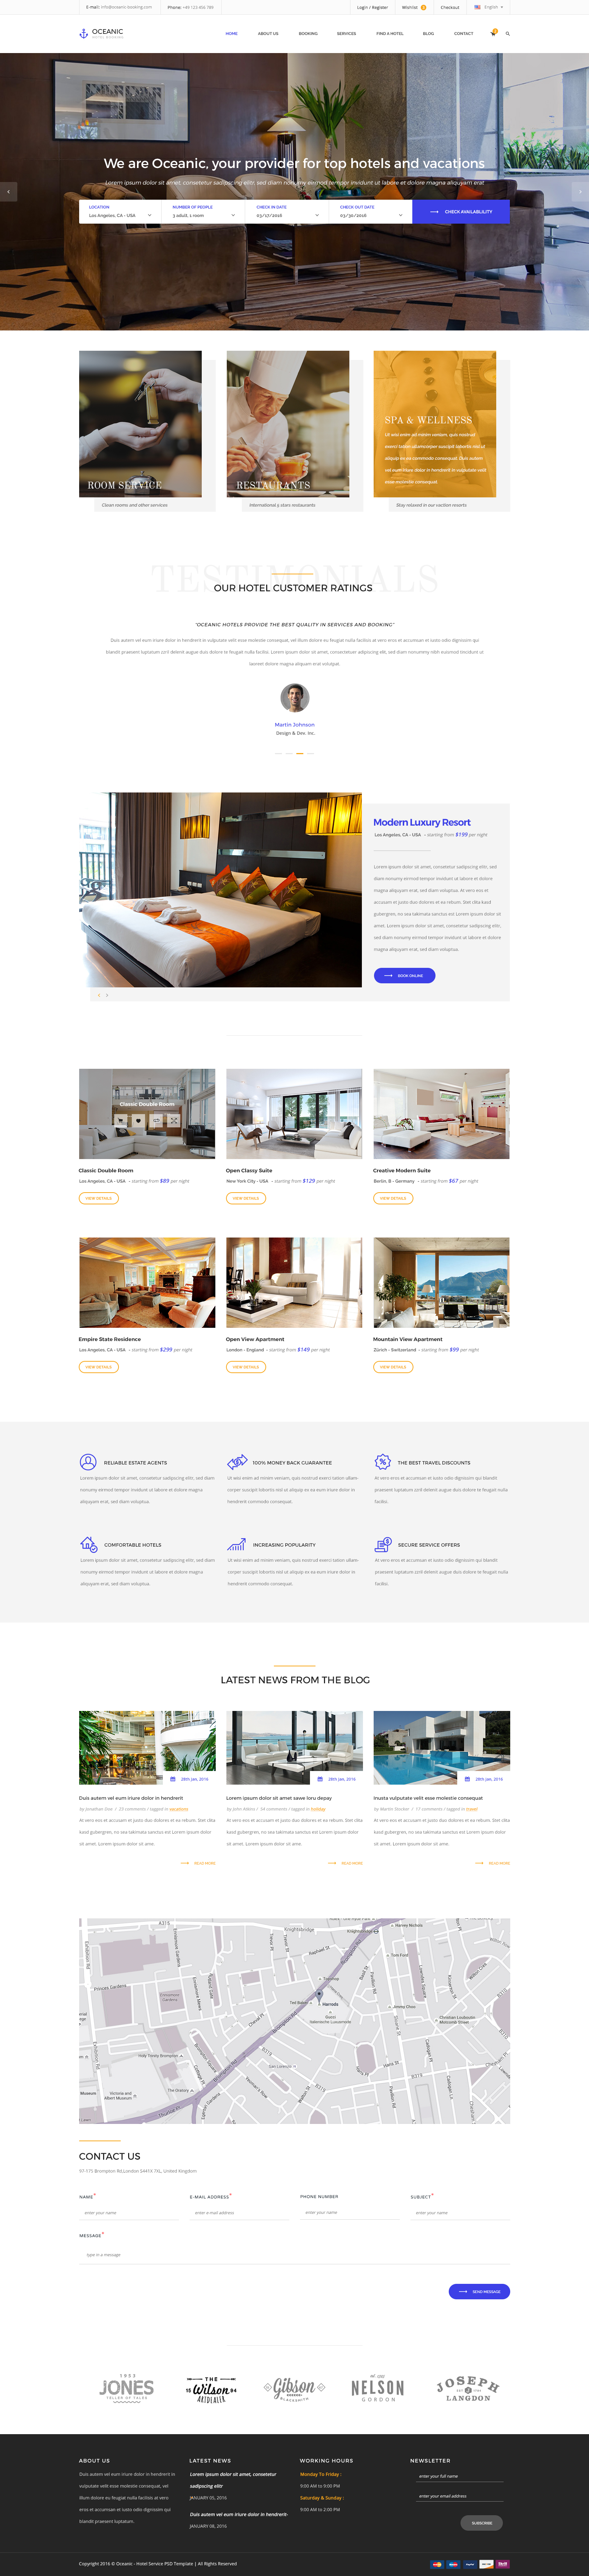 Oceanic - Hotel Booking PSD template by KL-Webmedia